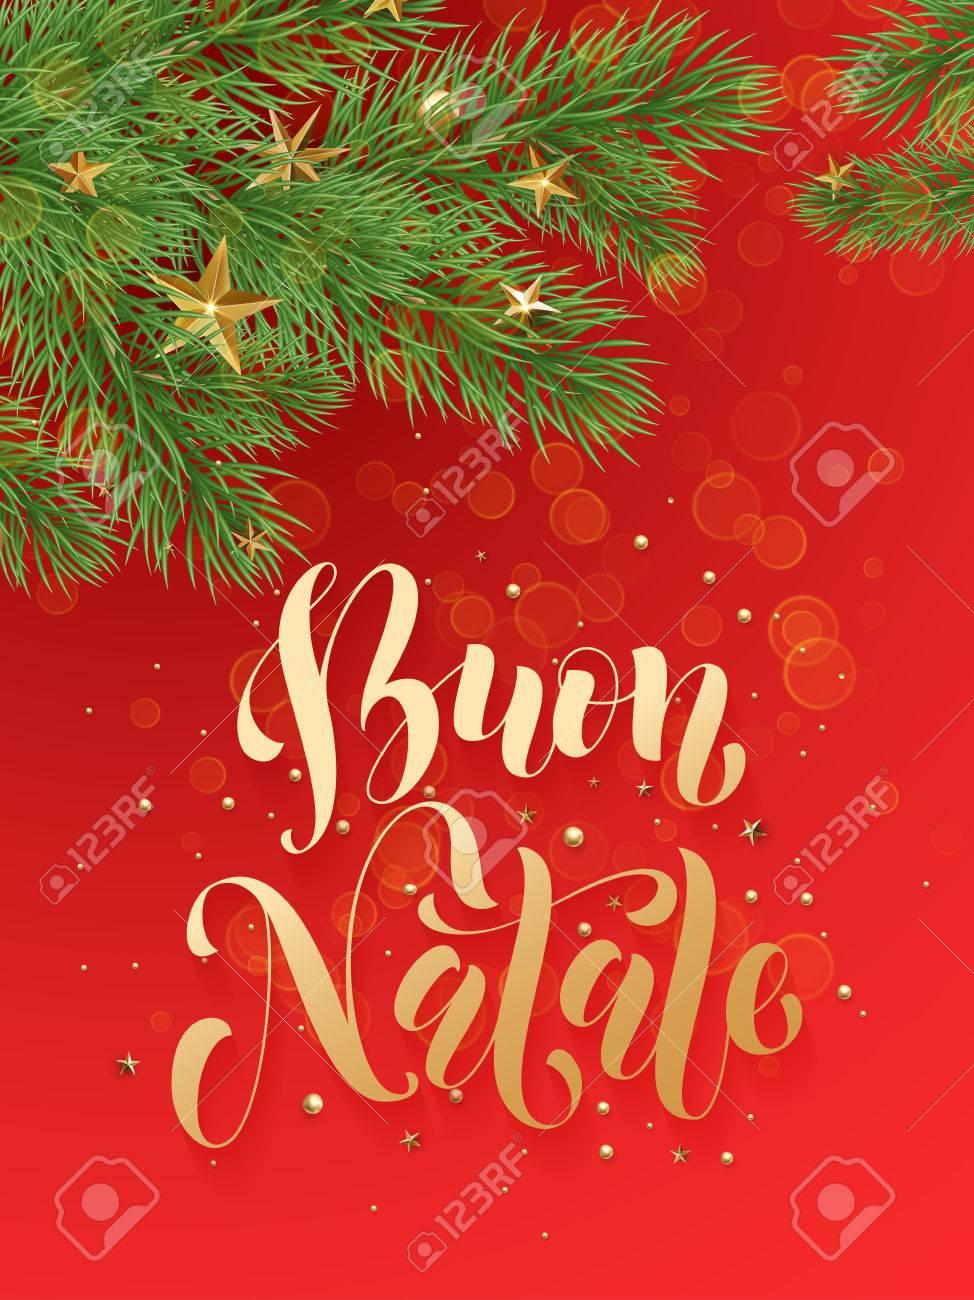 Buon Natale Ornament.Buon Natale Italian Merry Christmas Background Decoration Ornaments